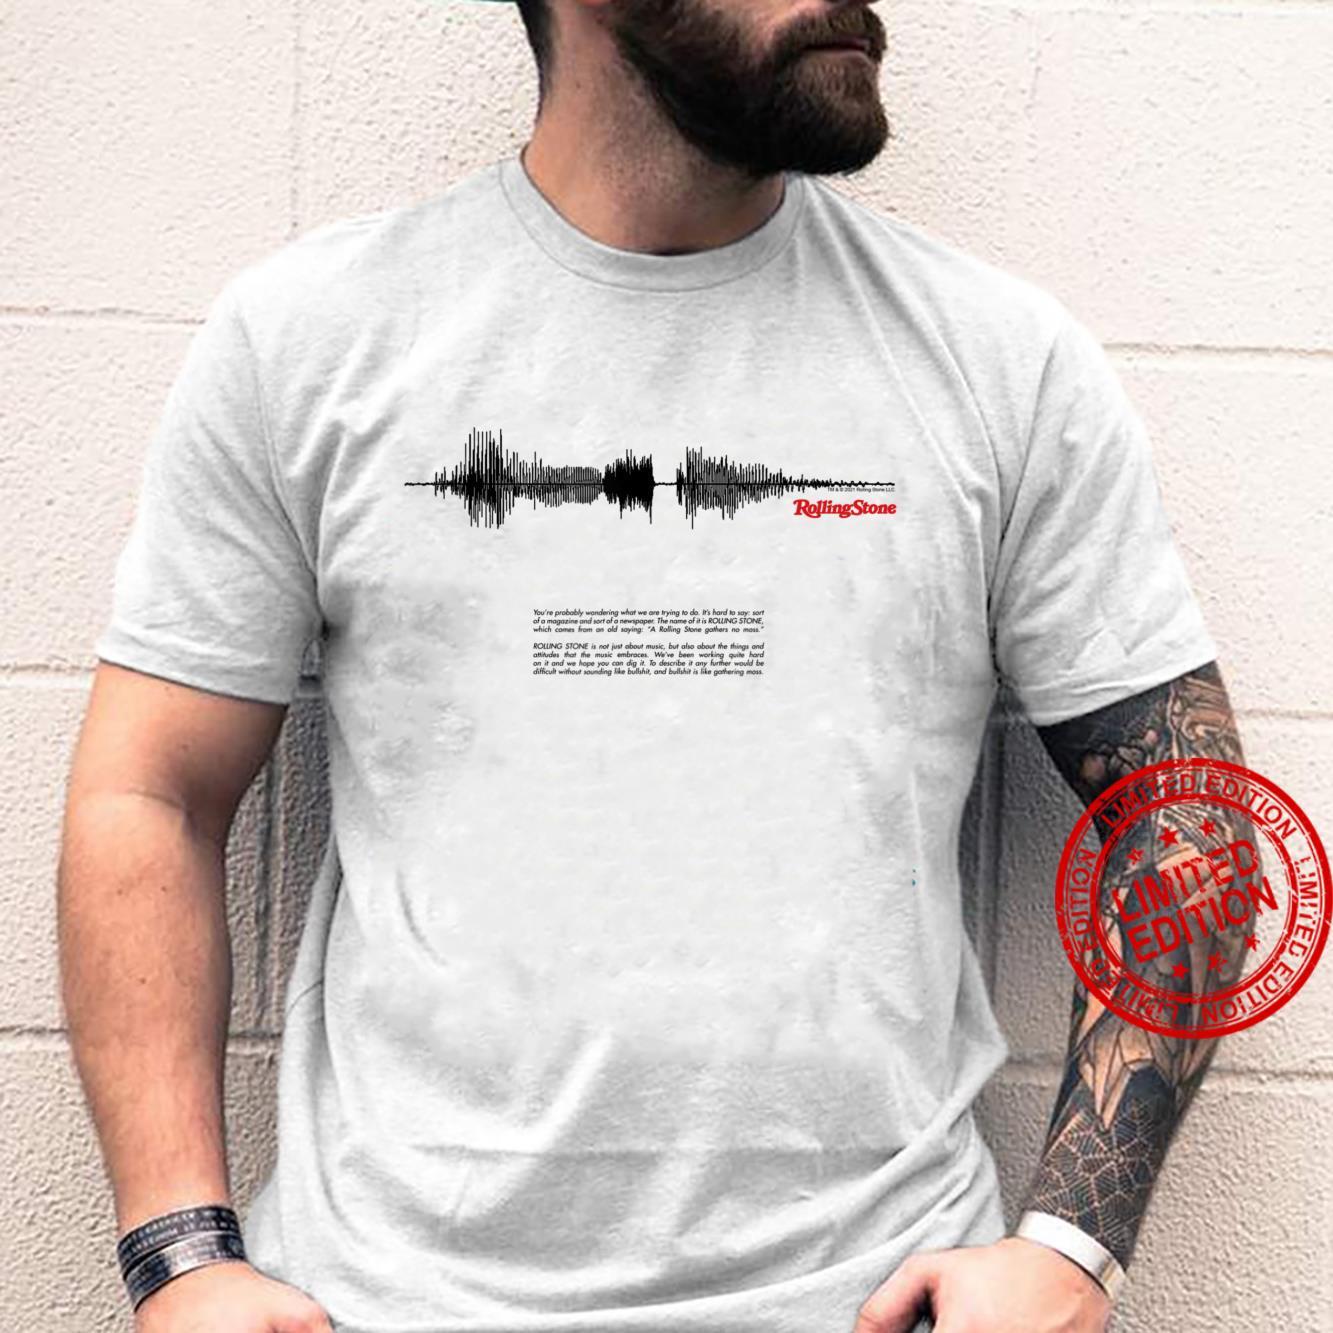 Rolling Stone Soundwave Shirt